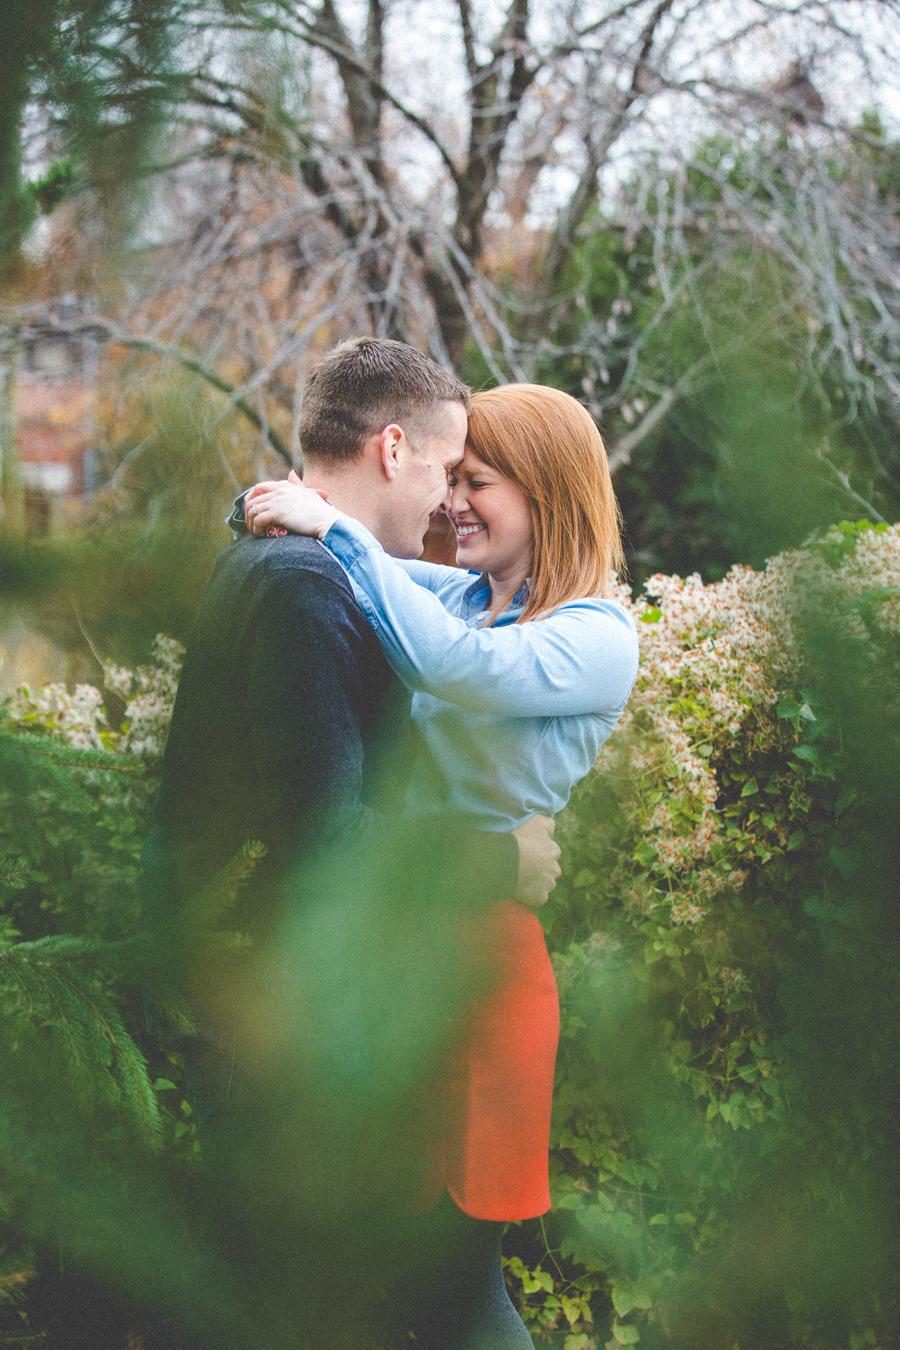 Lailee-Michael-Engagement-Blog-1-31.jpg